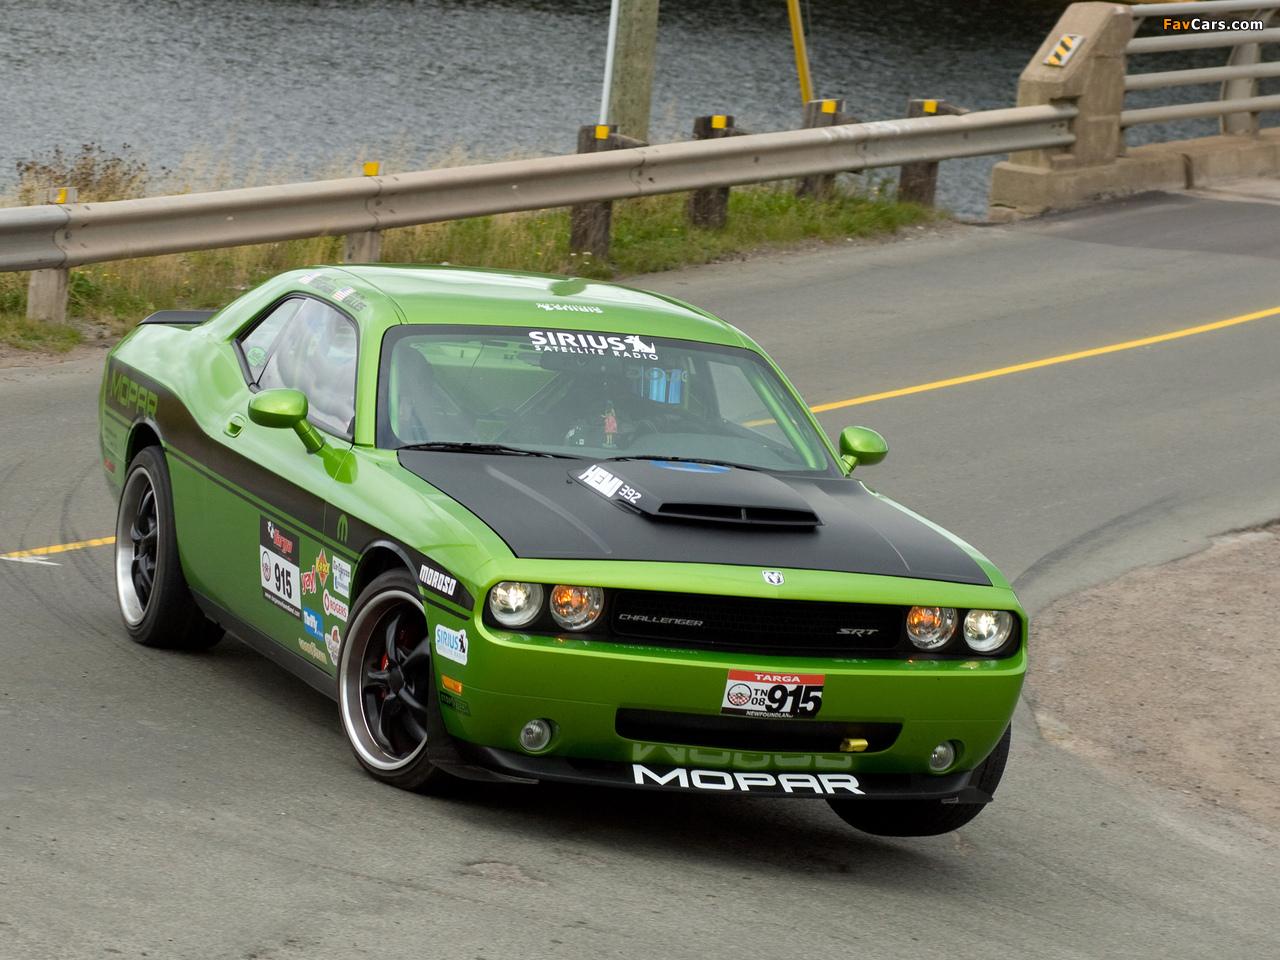 Dodge Challenger Targa Mopar Concept 2008 wallpapers (1280 x 960)